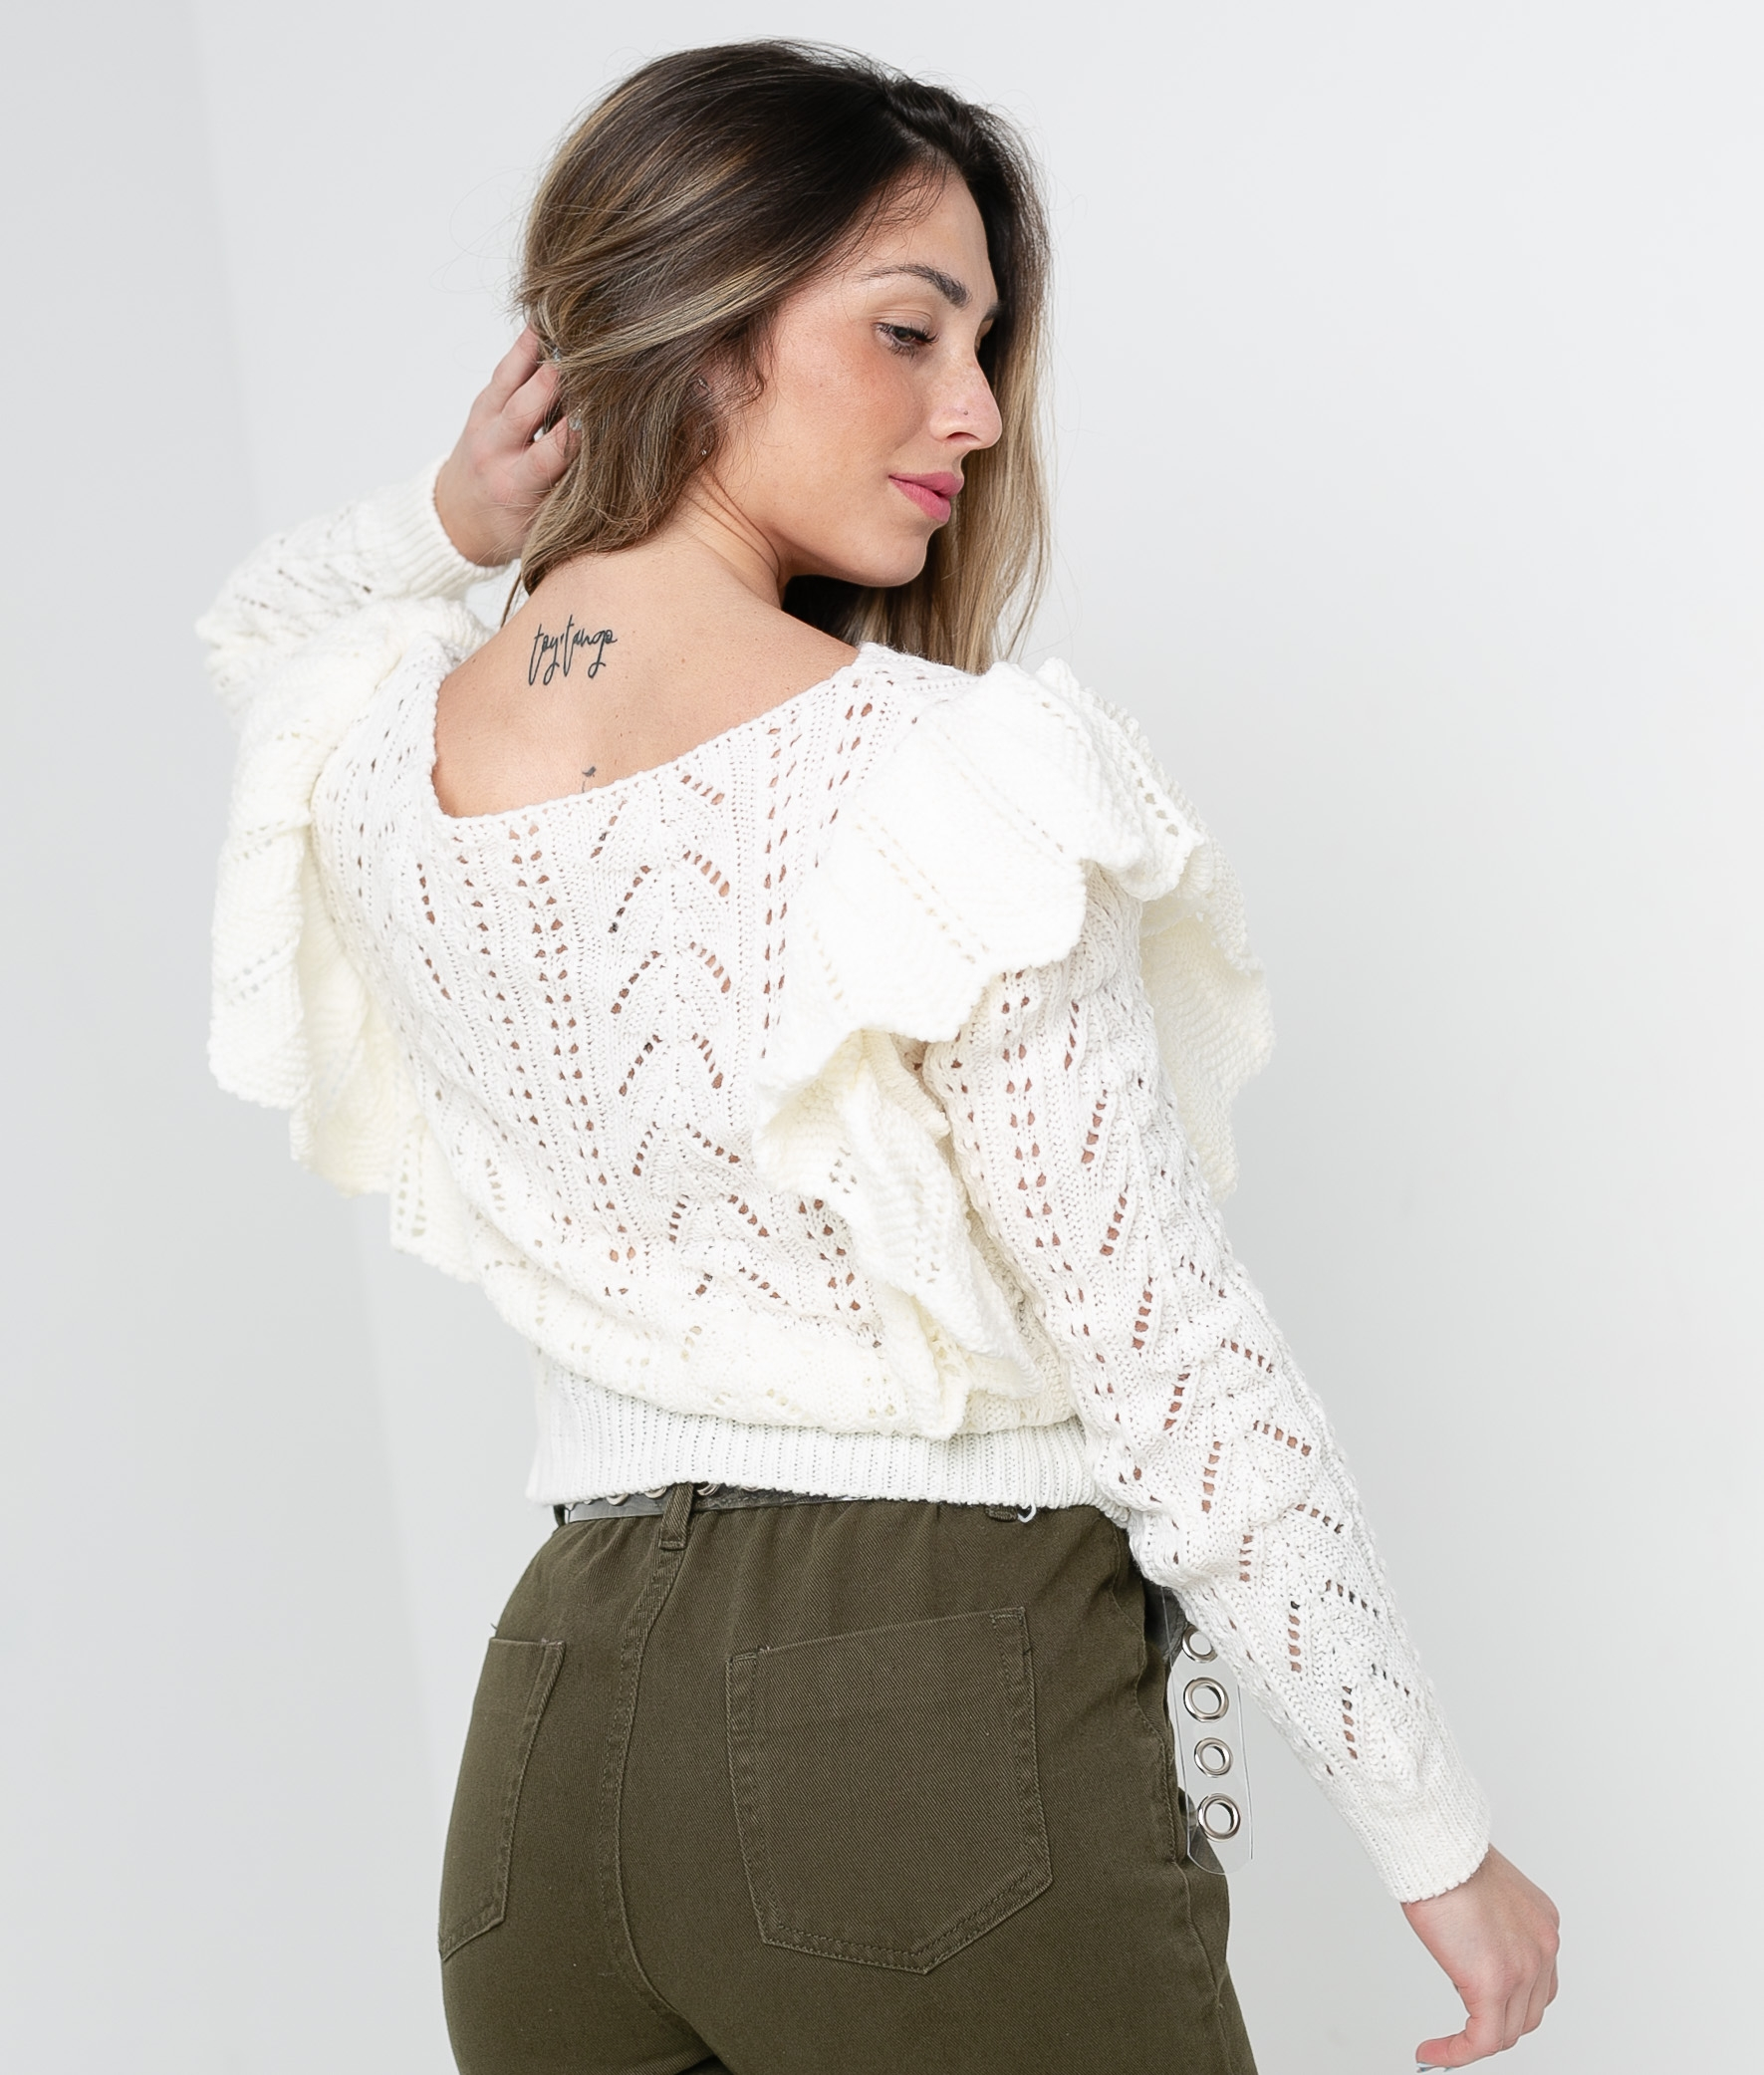 Maillot Jurena - Blanc